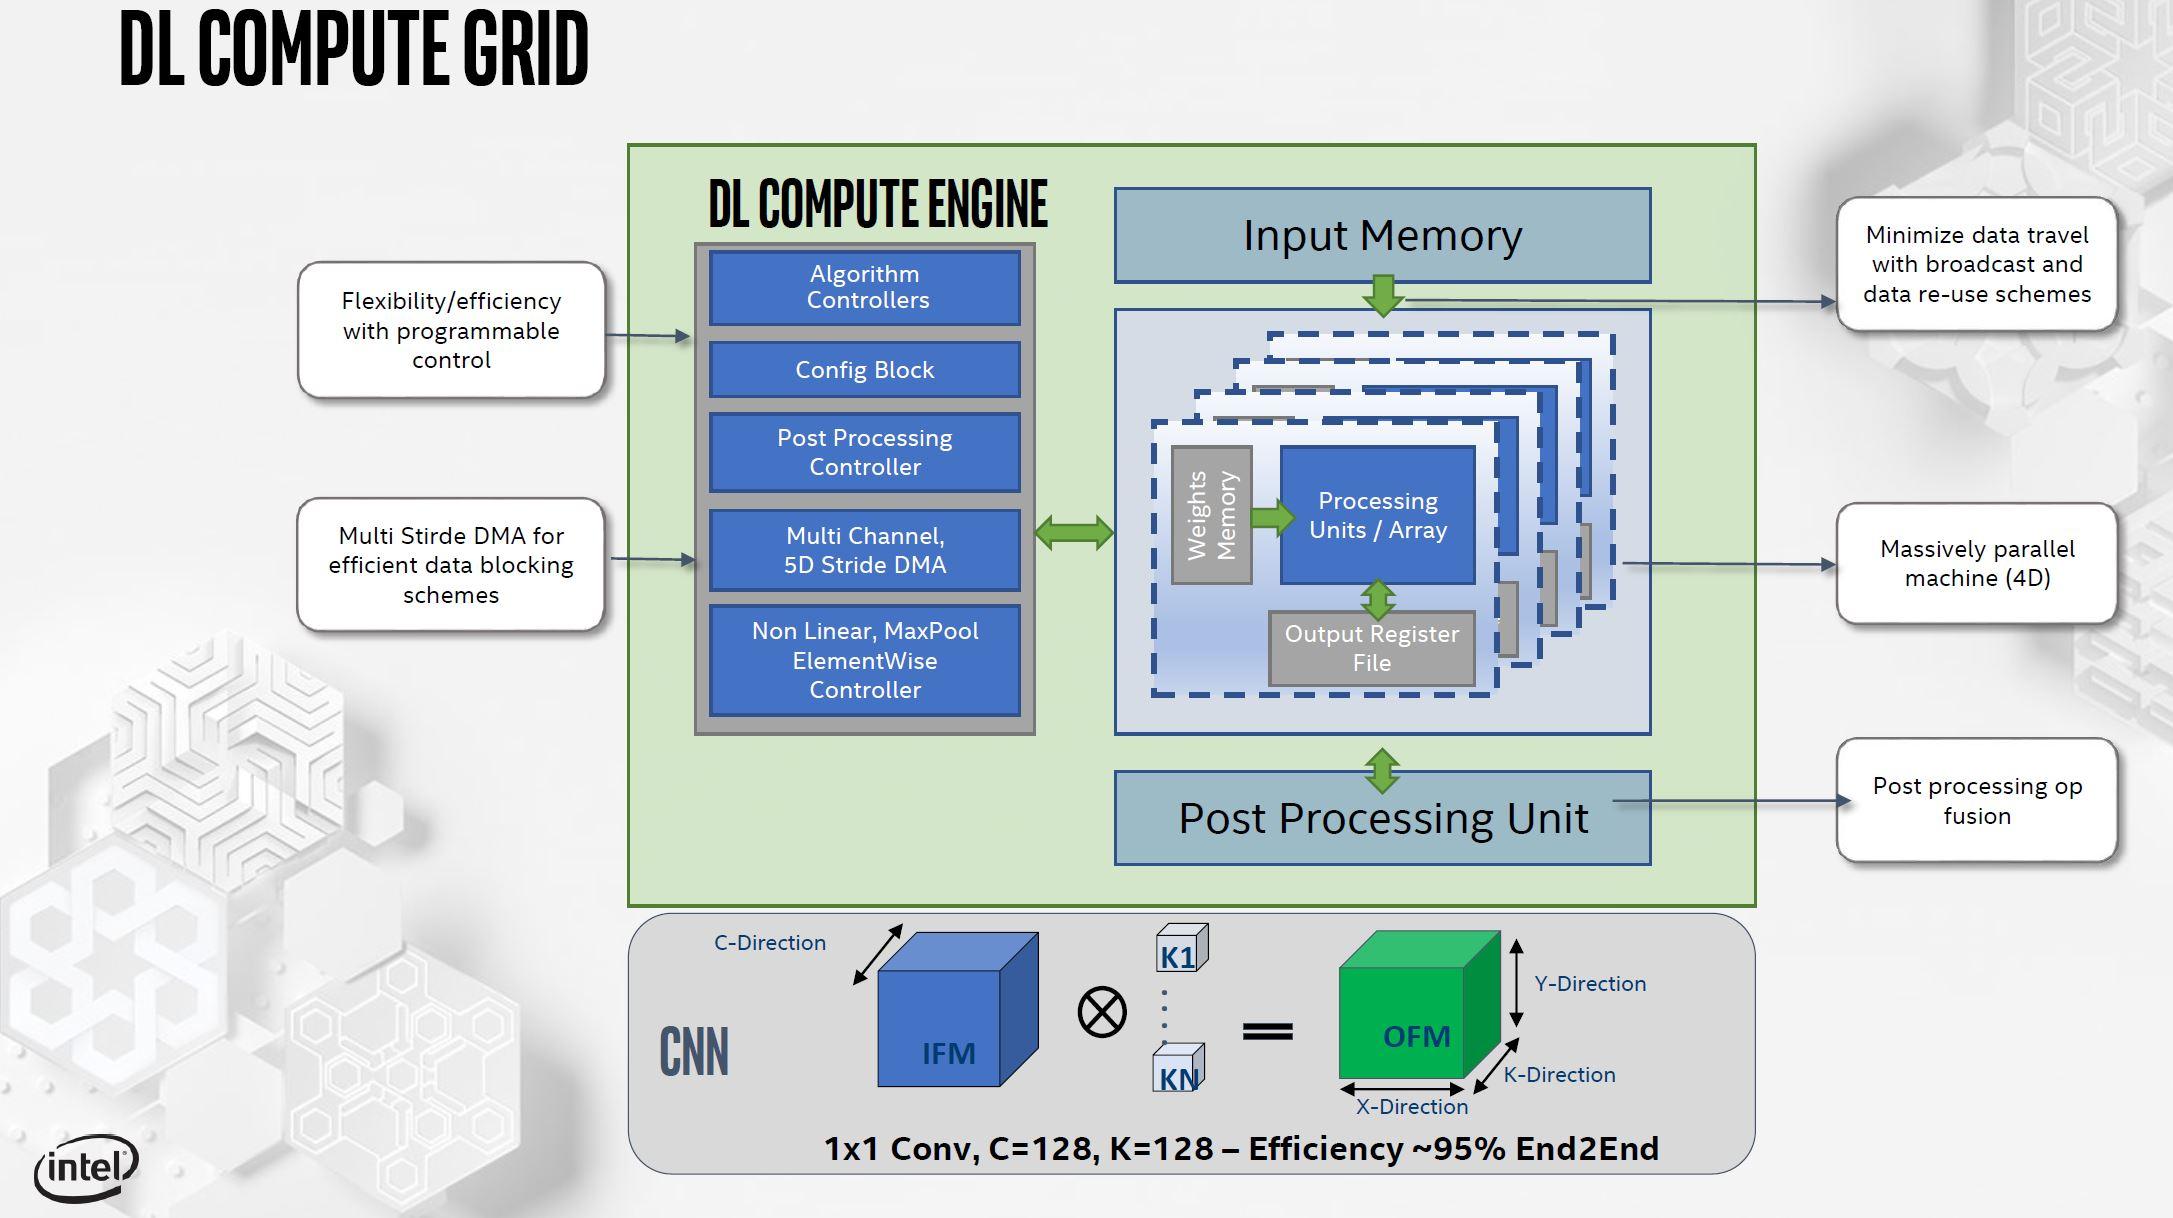 Intel NNP I 1000 Spring Hill DL Compute Grid